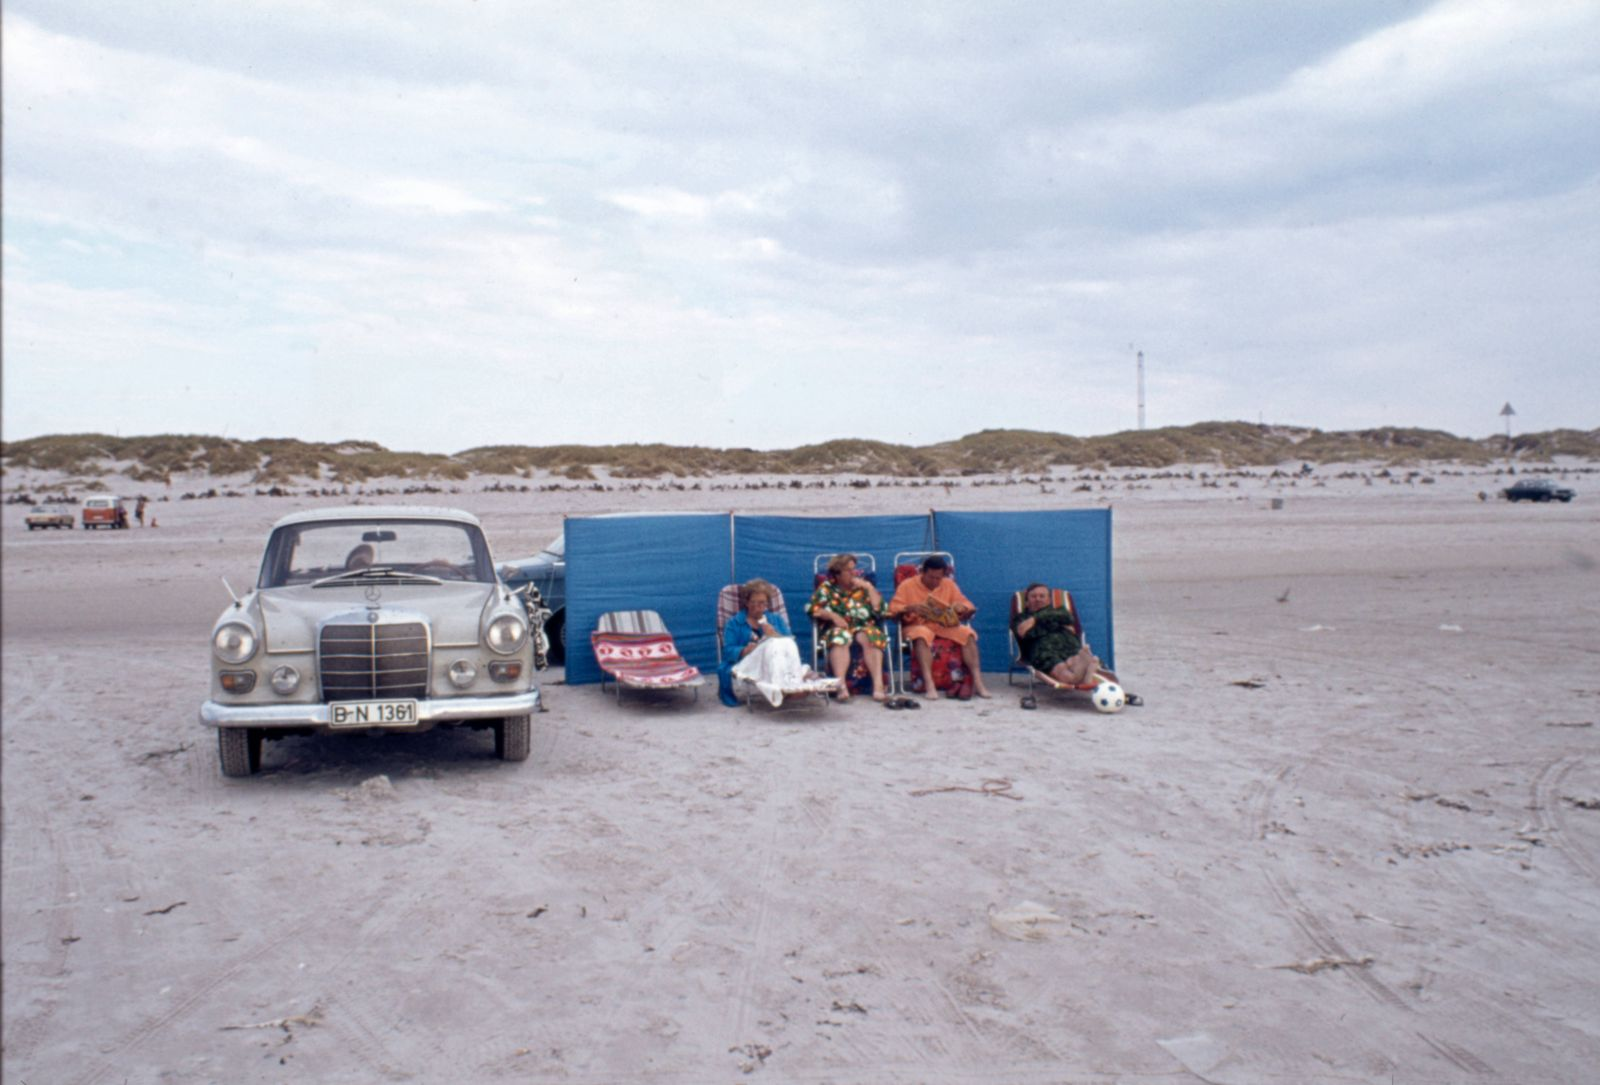 Camping GER, 20210108, Aufnahme ca.1962, Strandleben *** Camping GER, 20210108, photo ca 1962, beach life